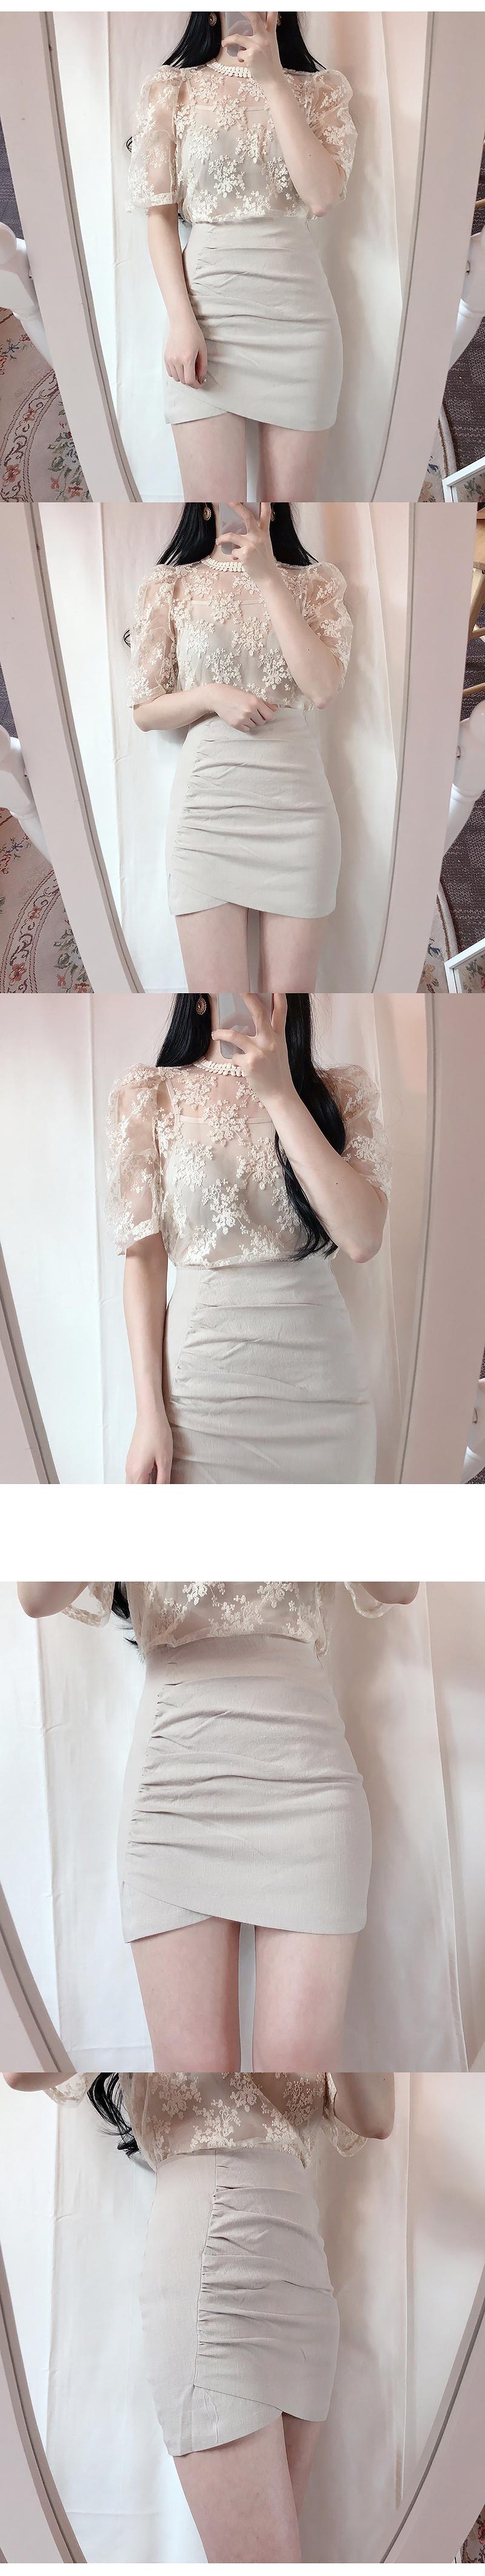 Order rush ♥ Fair race lace blouse